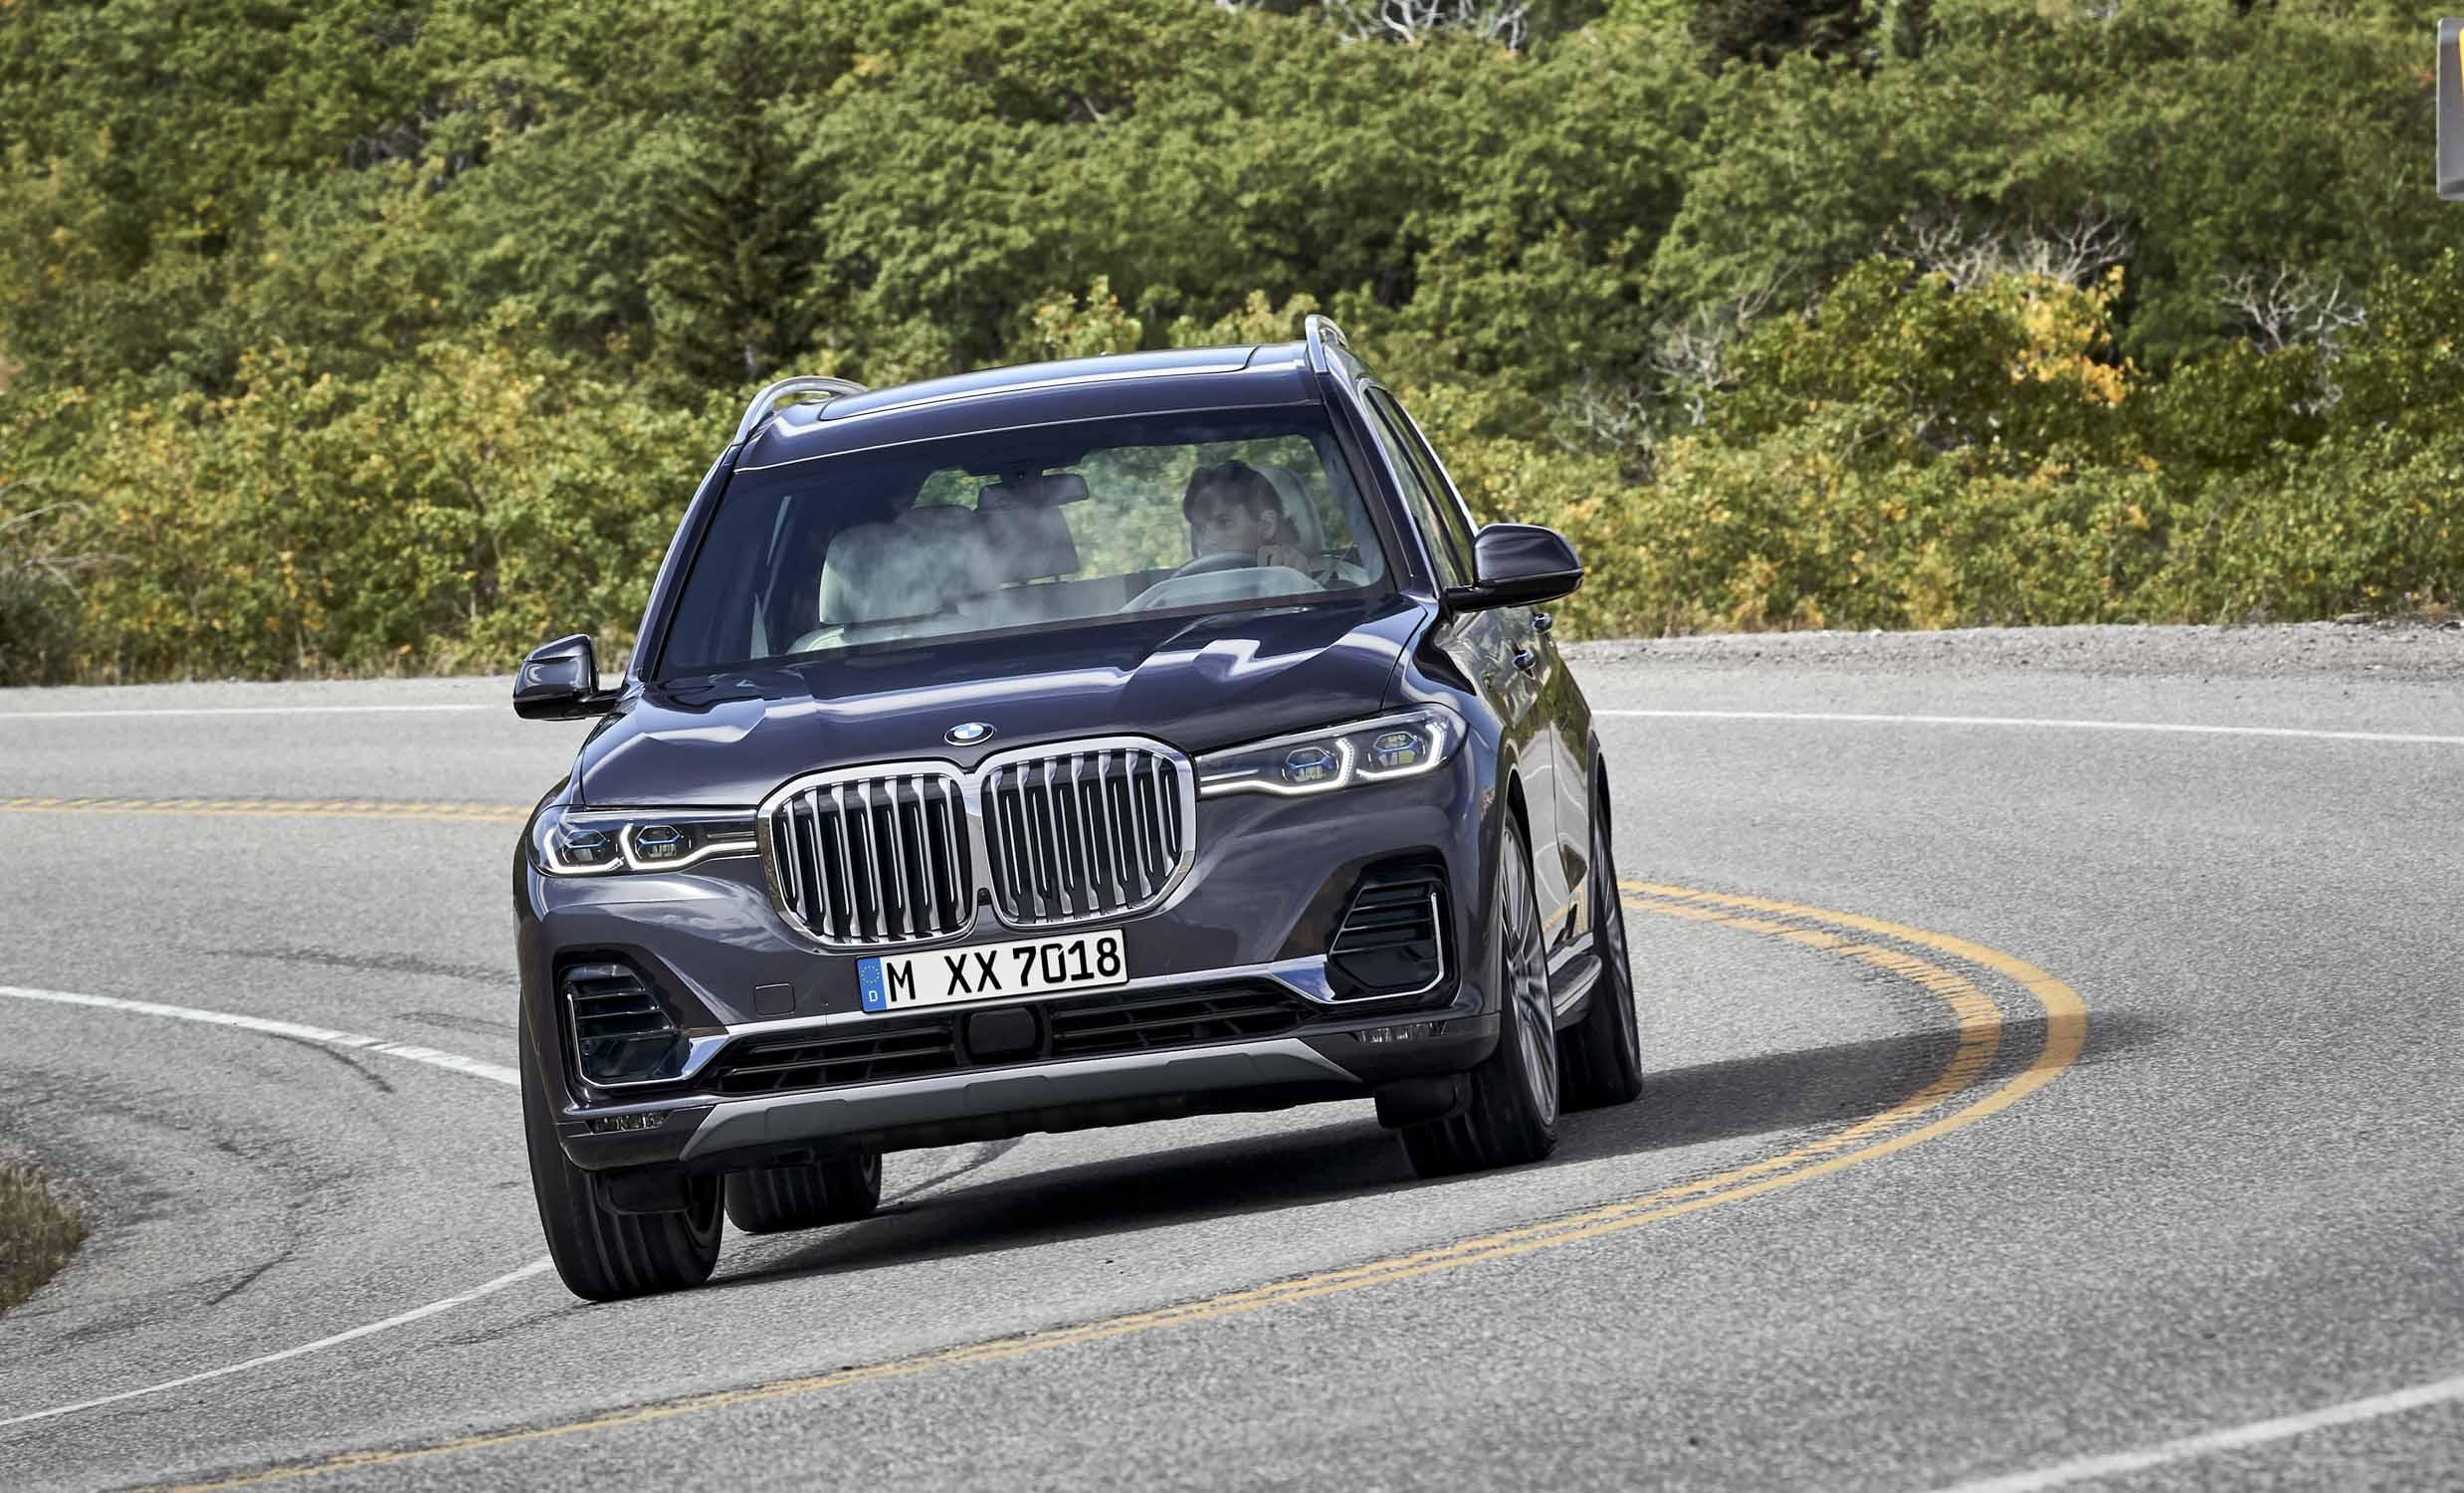 Permalink to 2019 BMW X7 Looks Massive Next To First X3